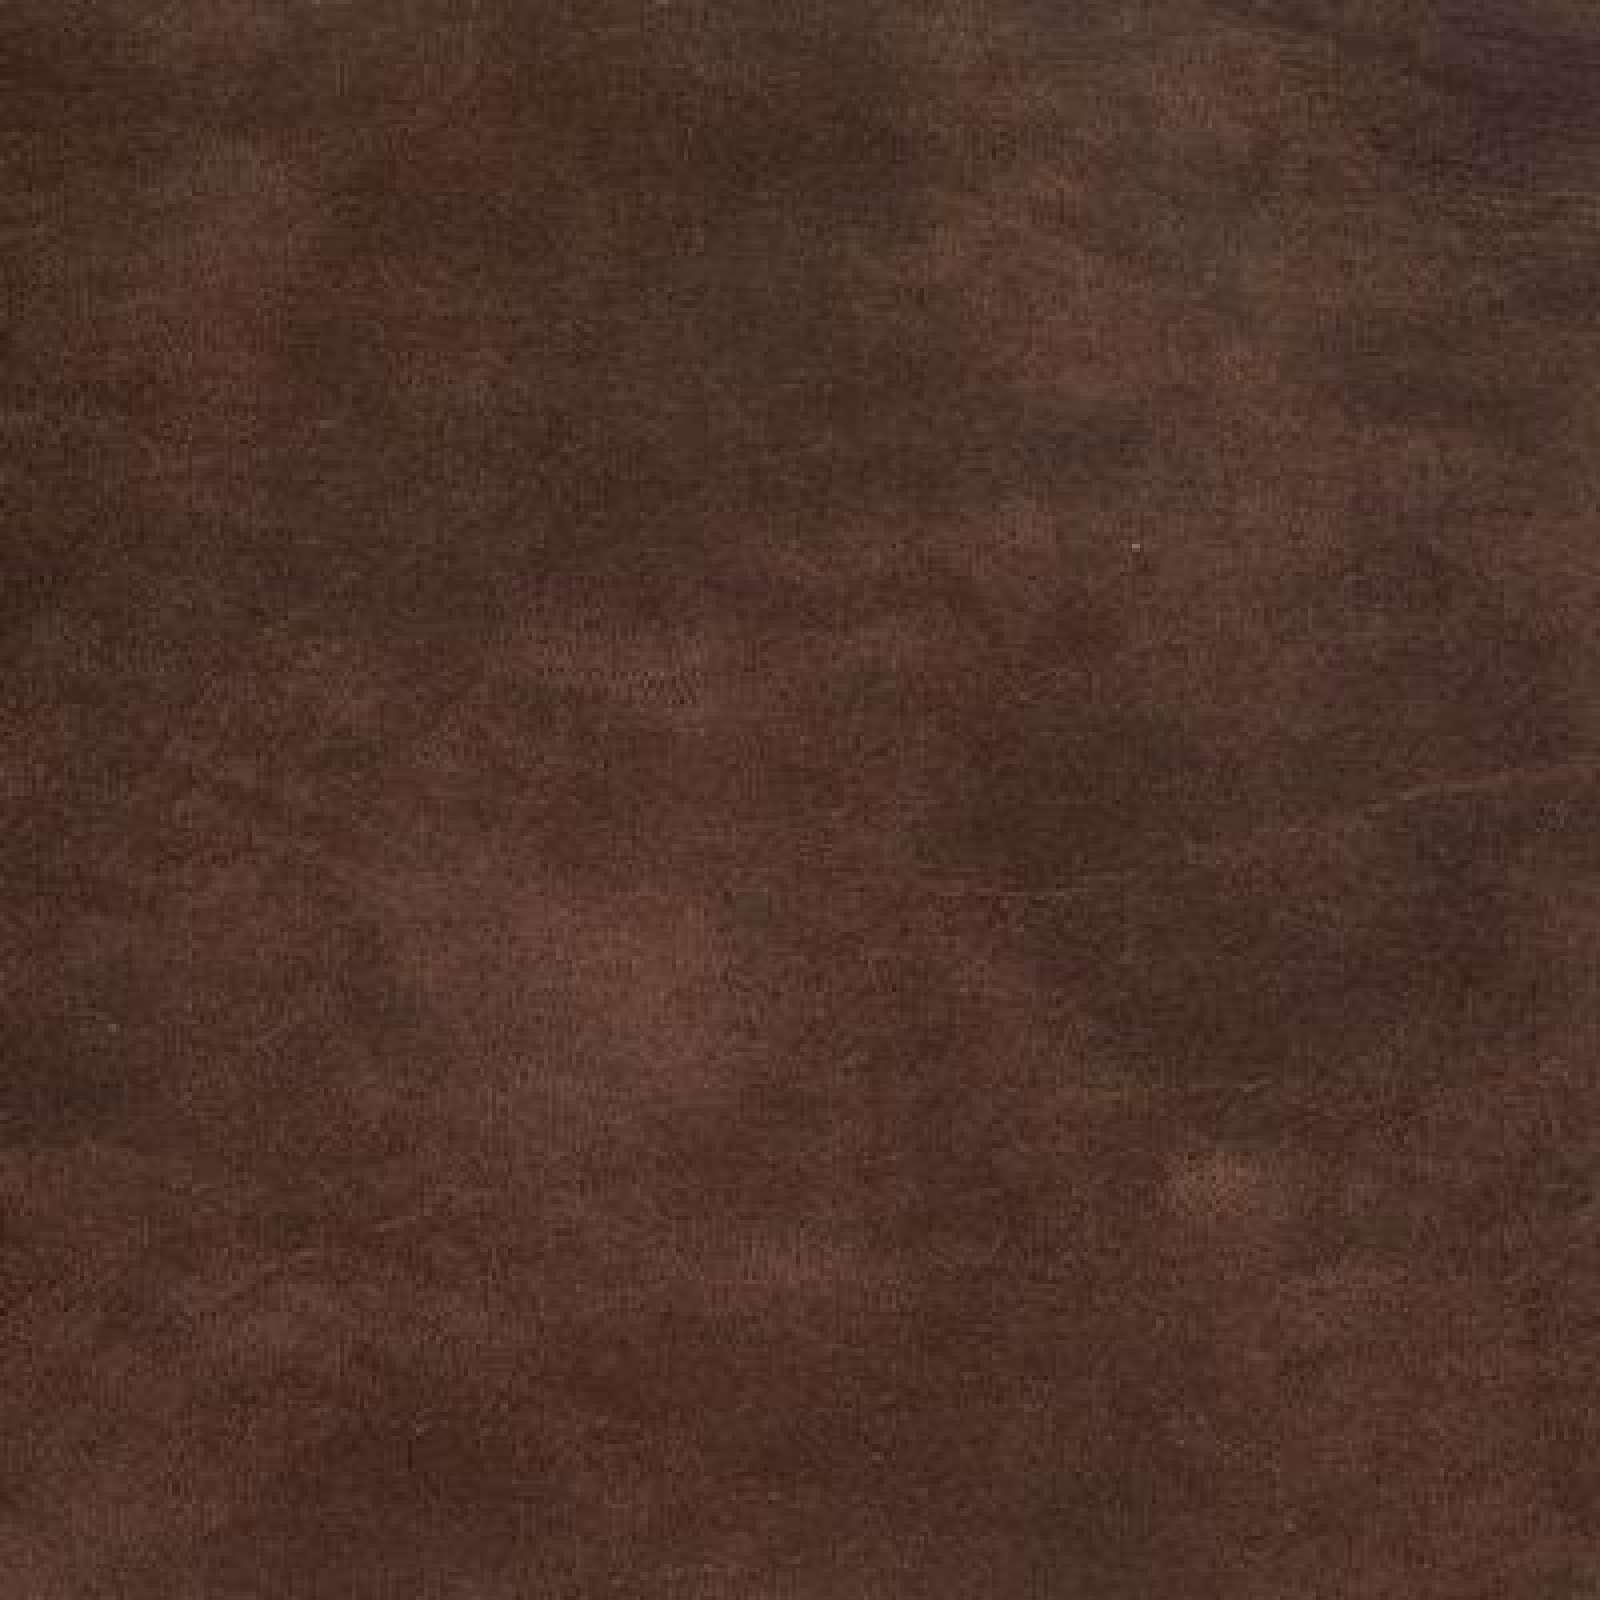 Softub Nackenkissen Fur Softub Whirlpool Farbe Mocca 34817000